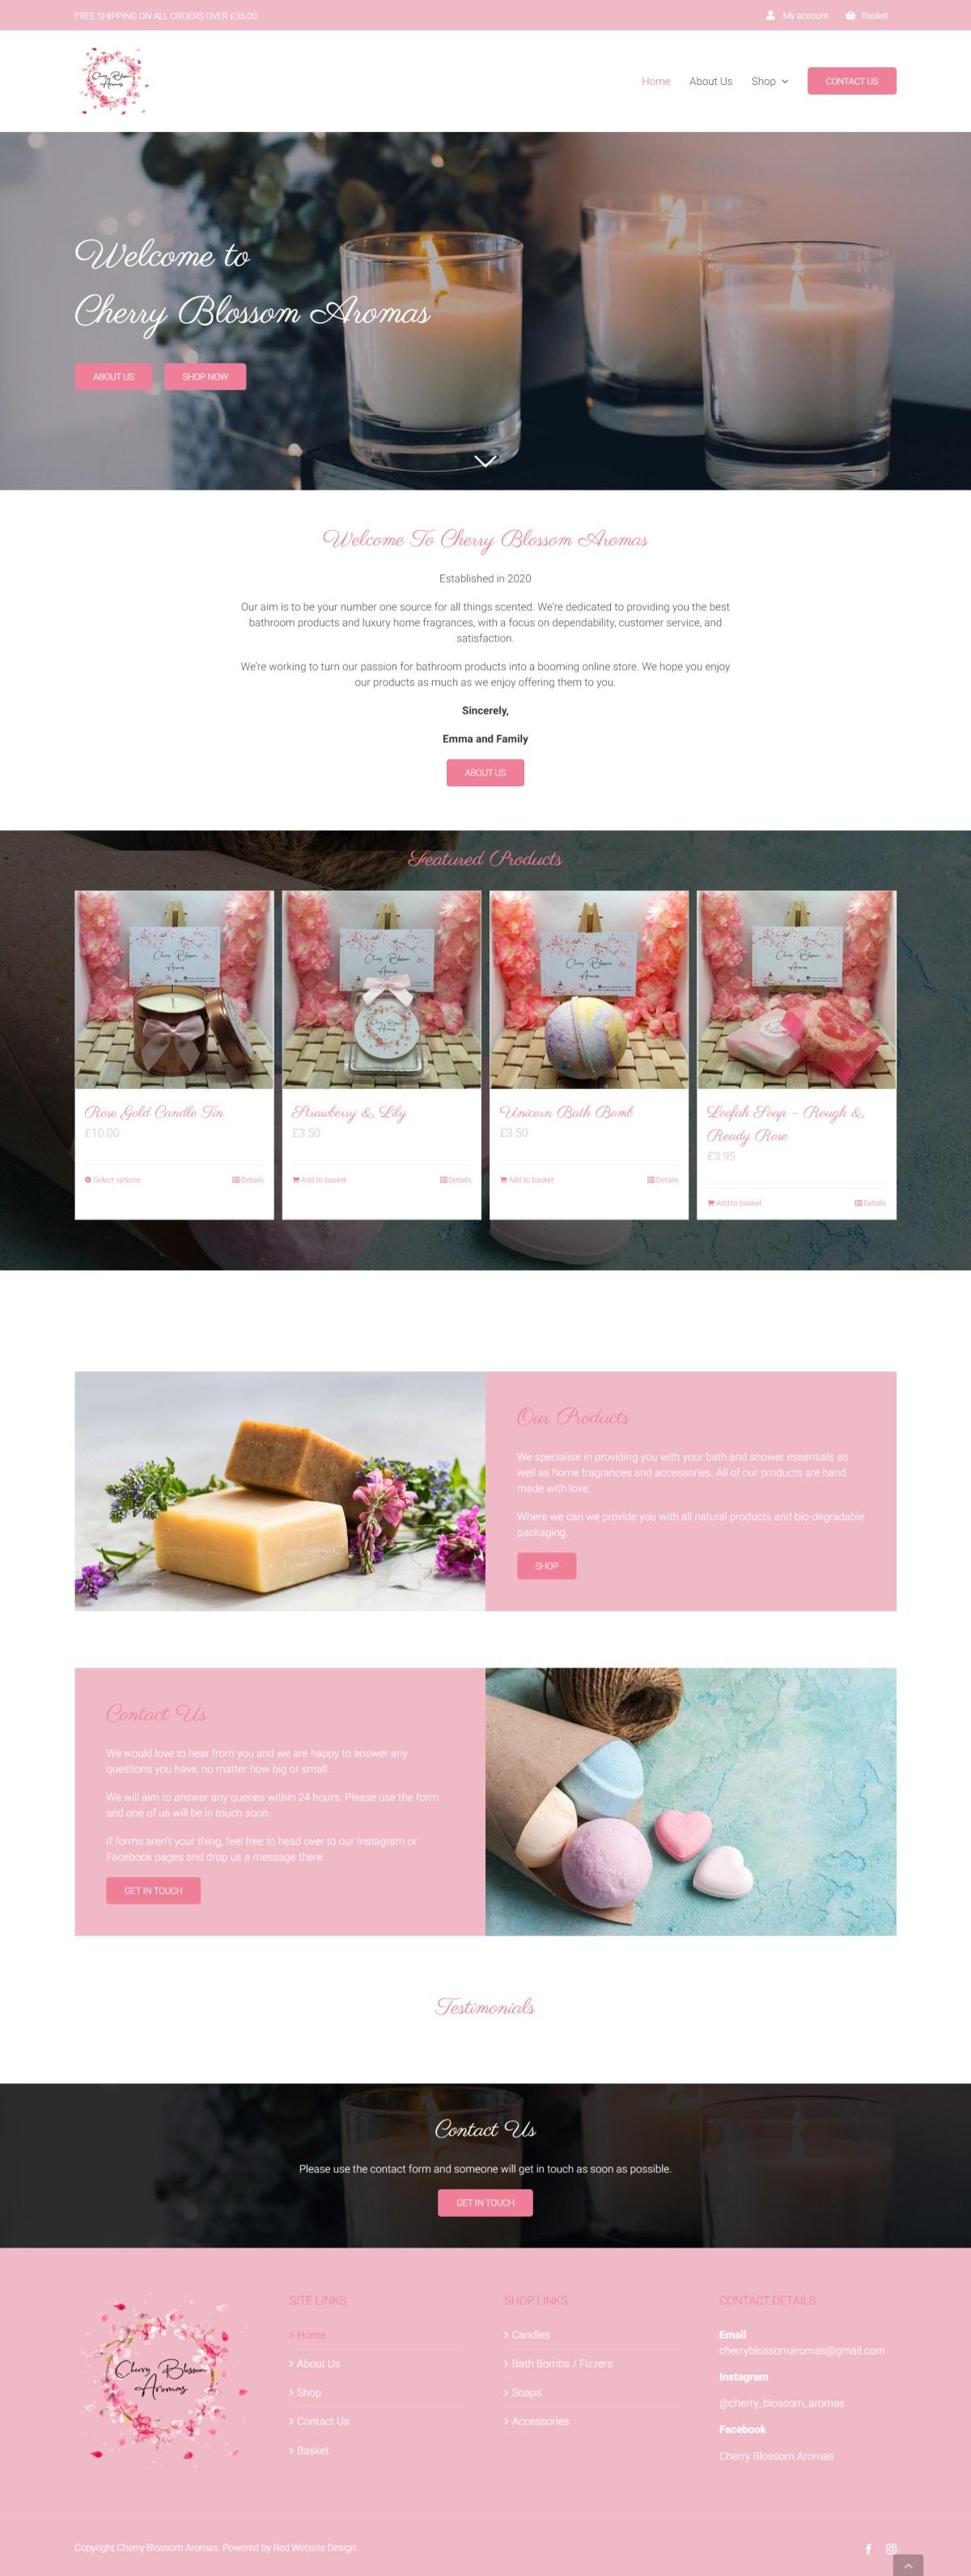 Web Design Tamworth